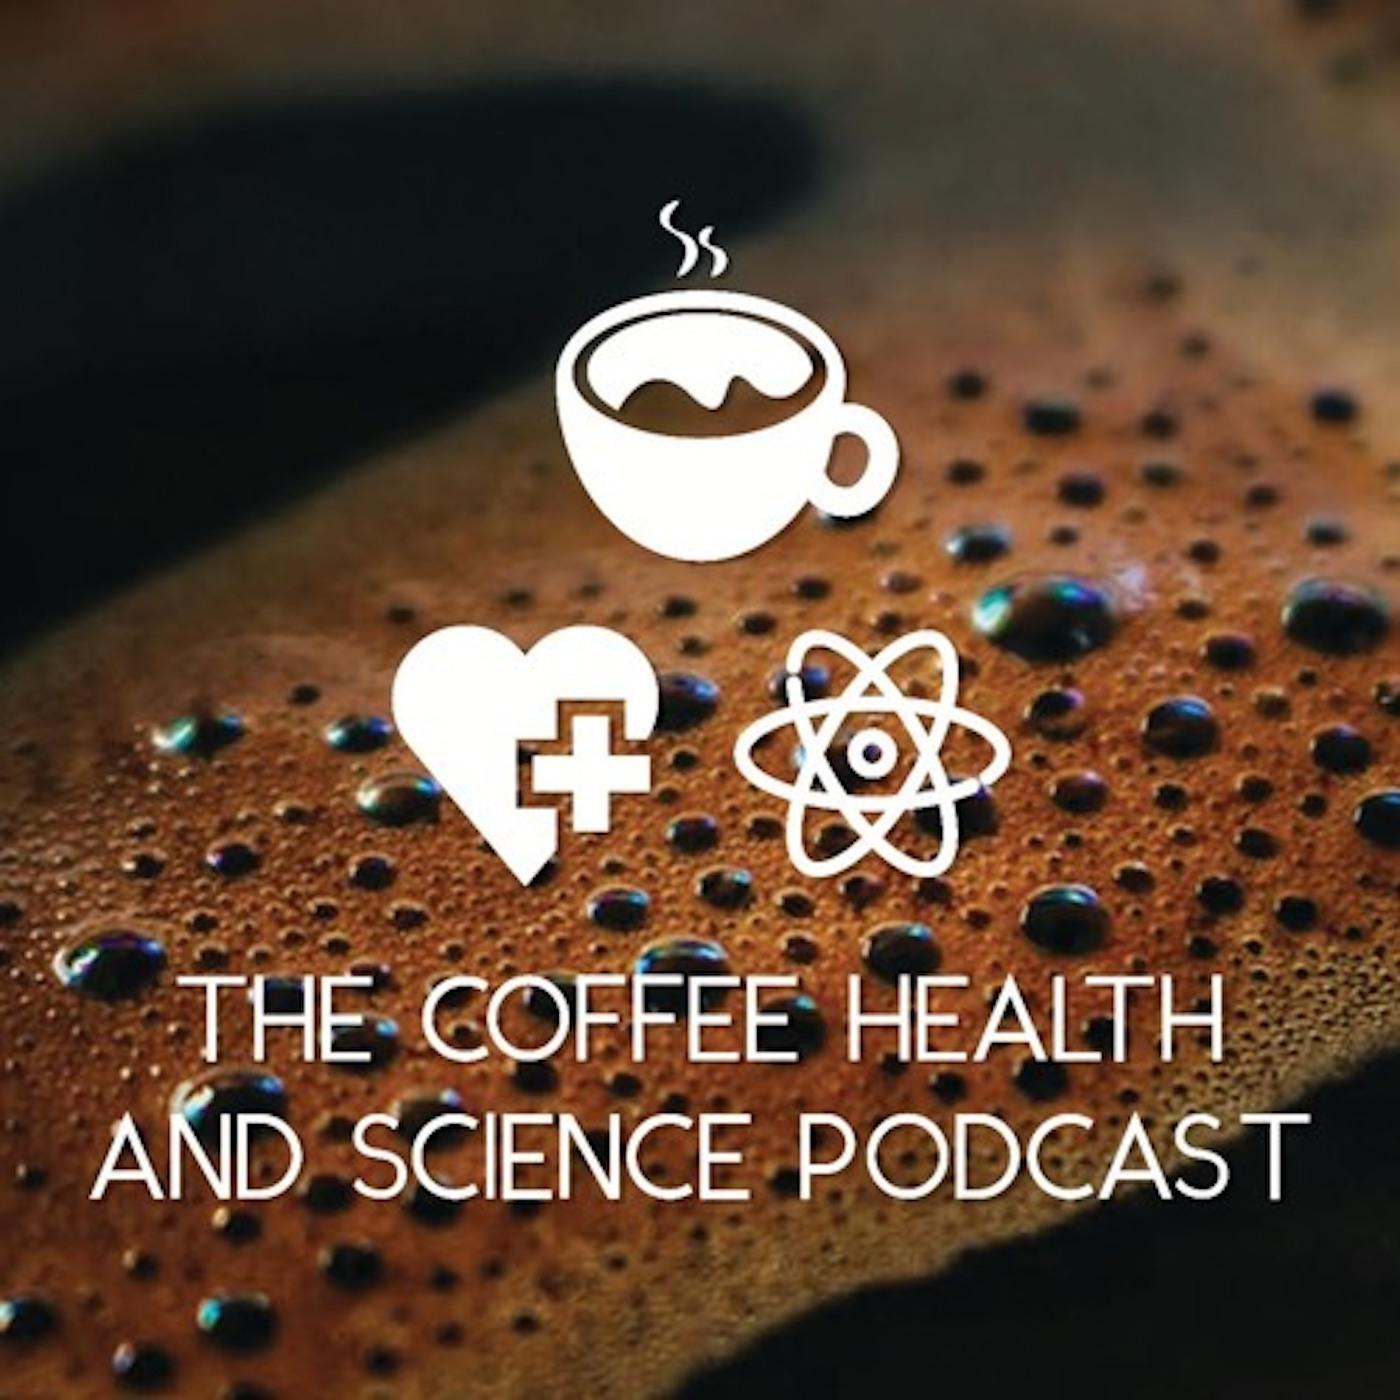 Liver Health, Cirrhosis, Fatty Liver Disease, and Coffee, with Dr. Sanjiv Chopra